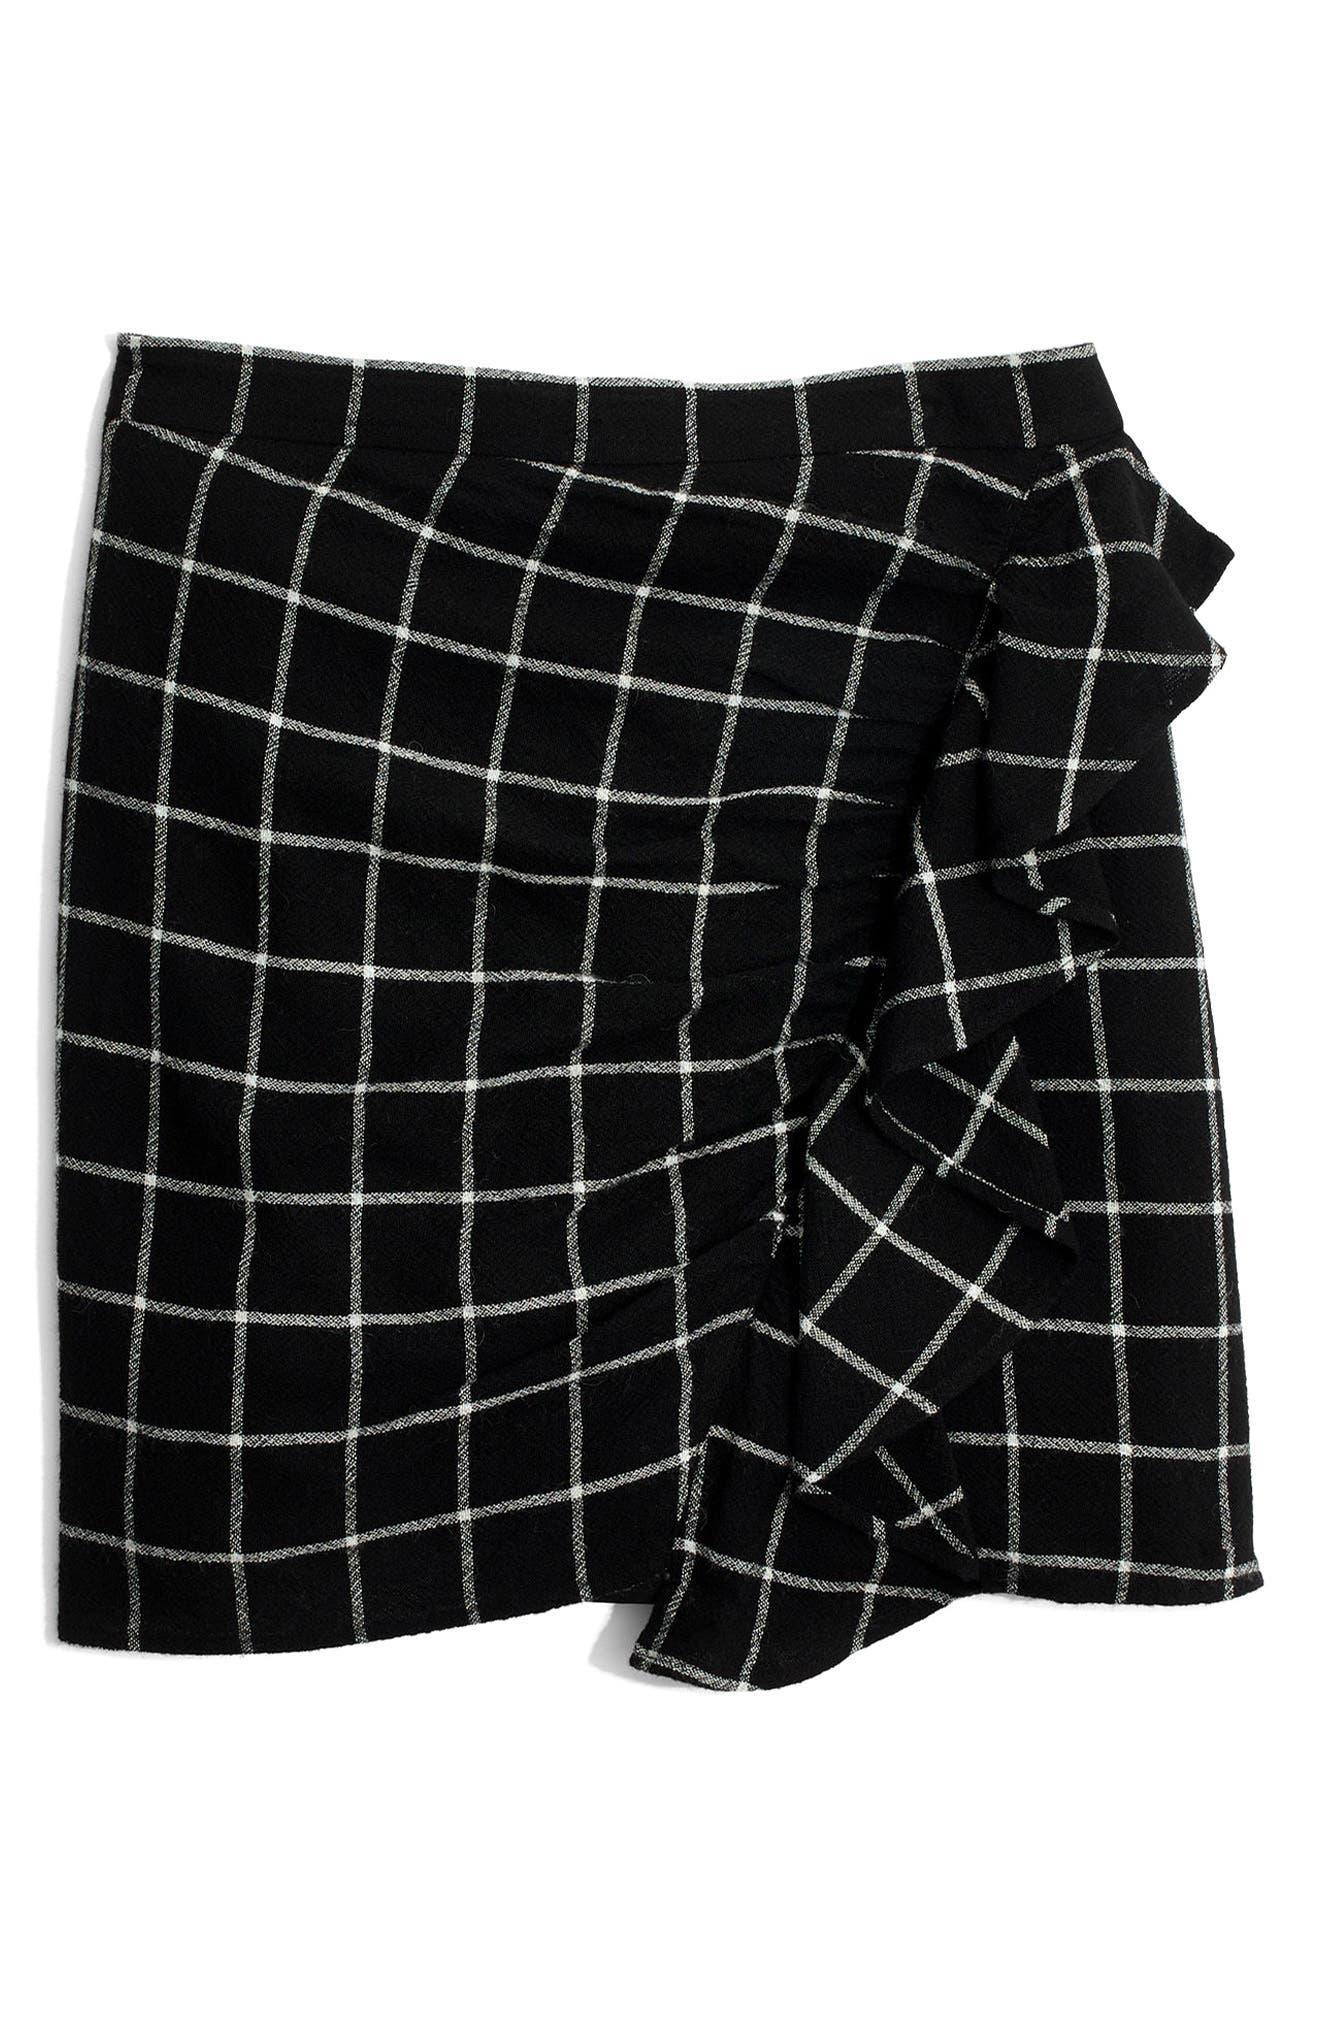 MADEWELL, Windowpane Ruffle Front Miniskirt, Alternate thumbnail 4, color, 009